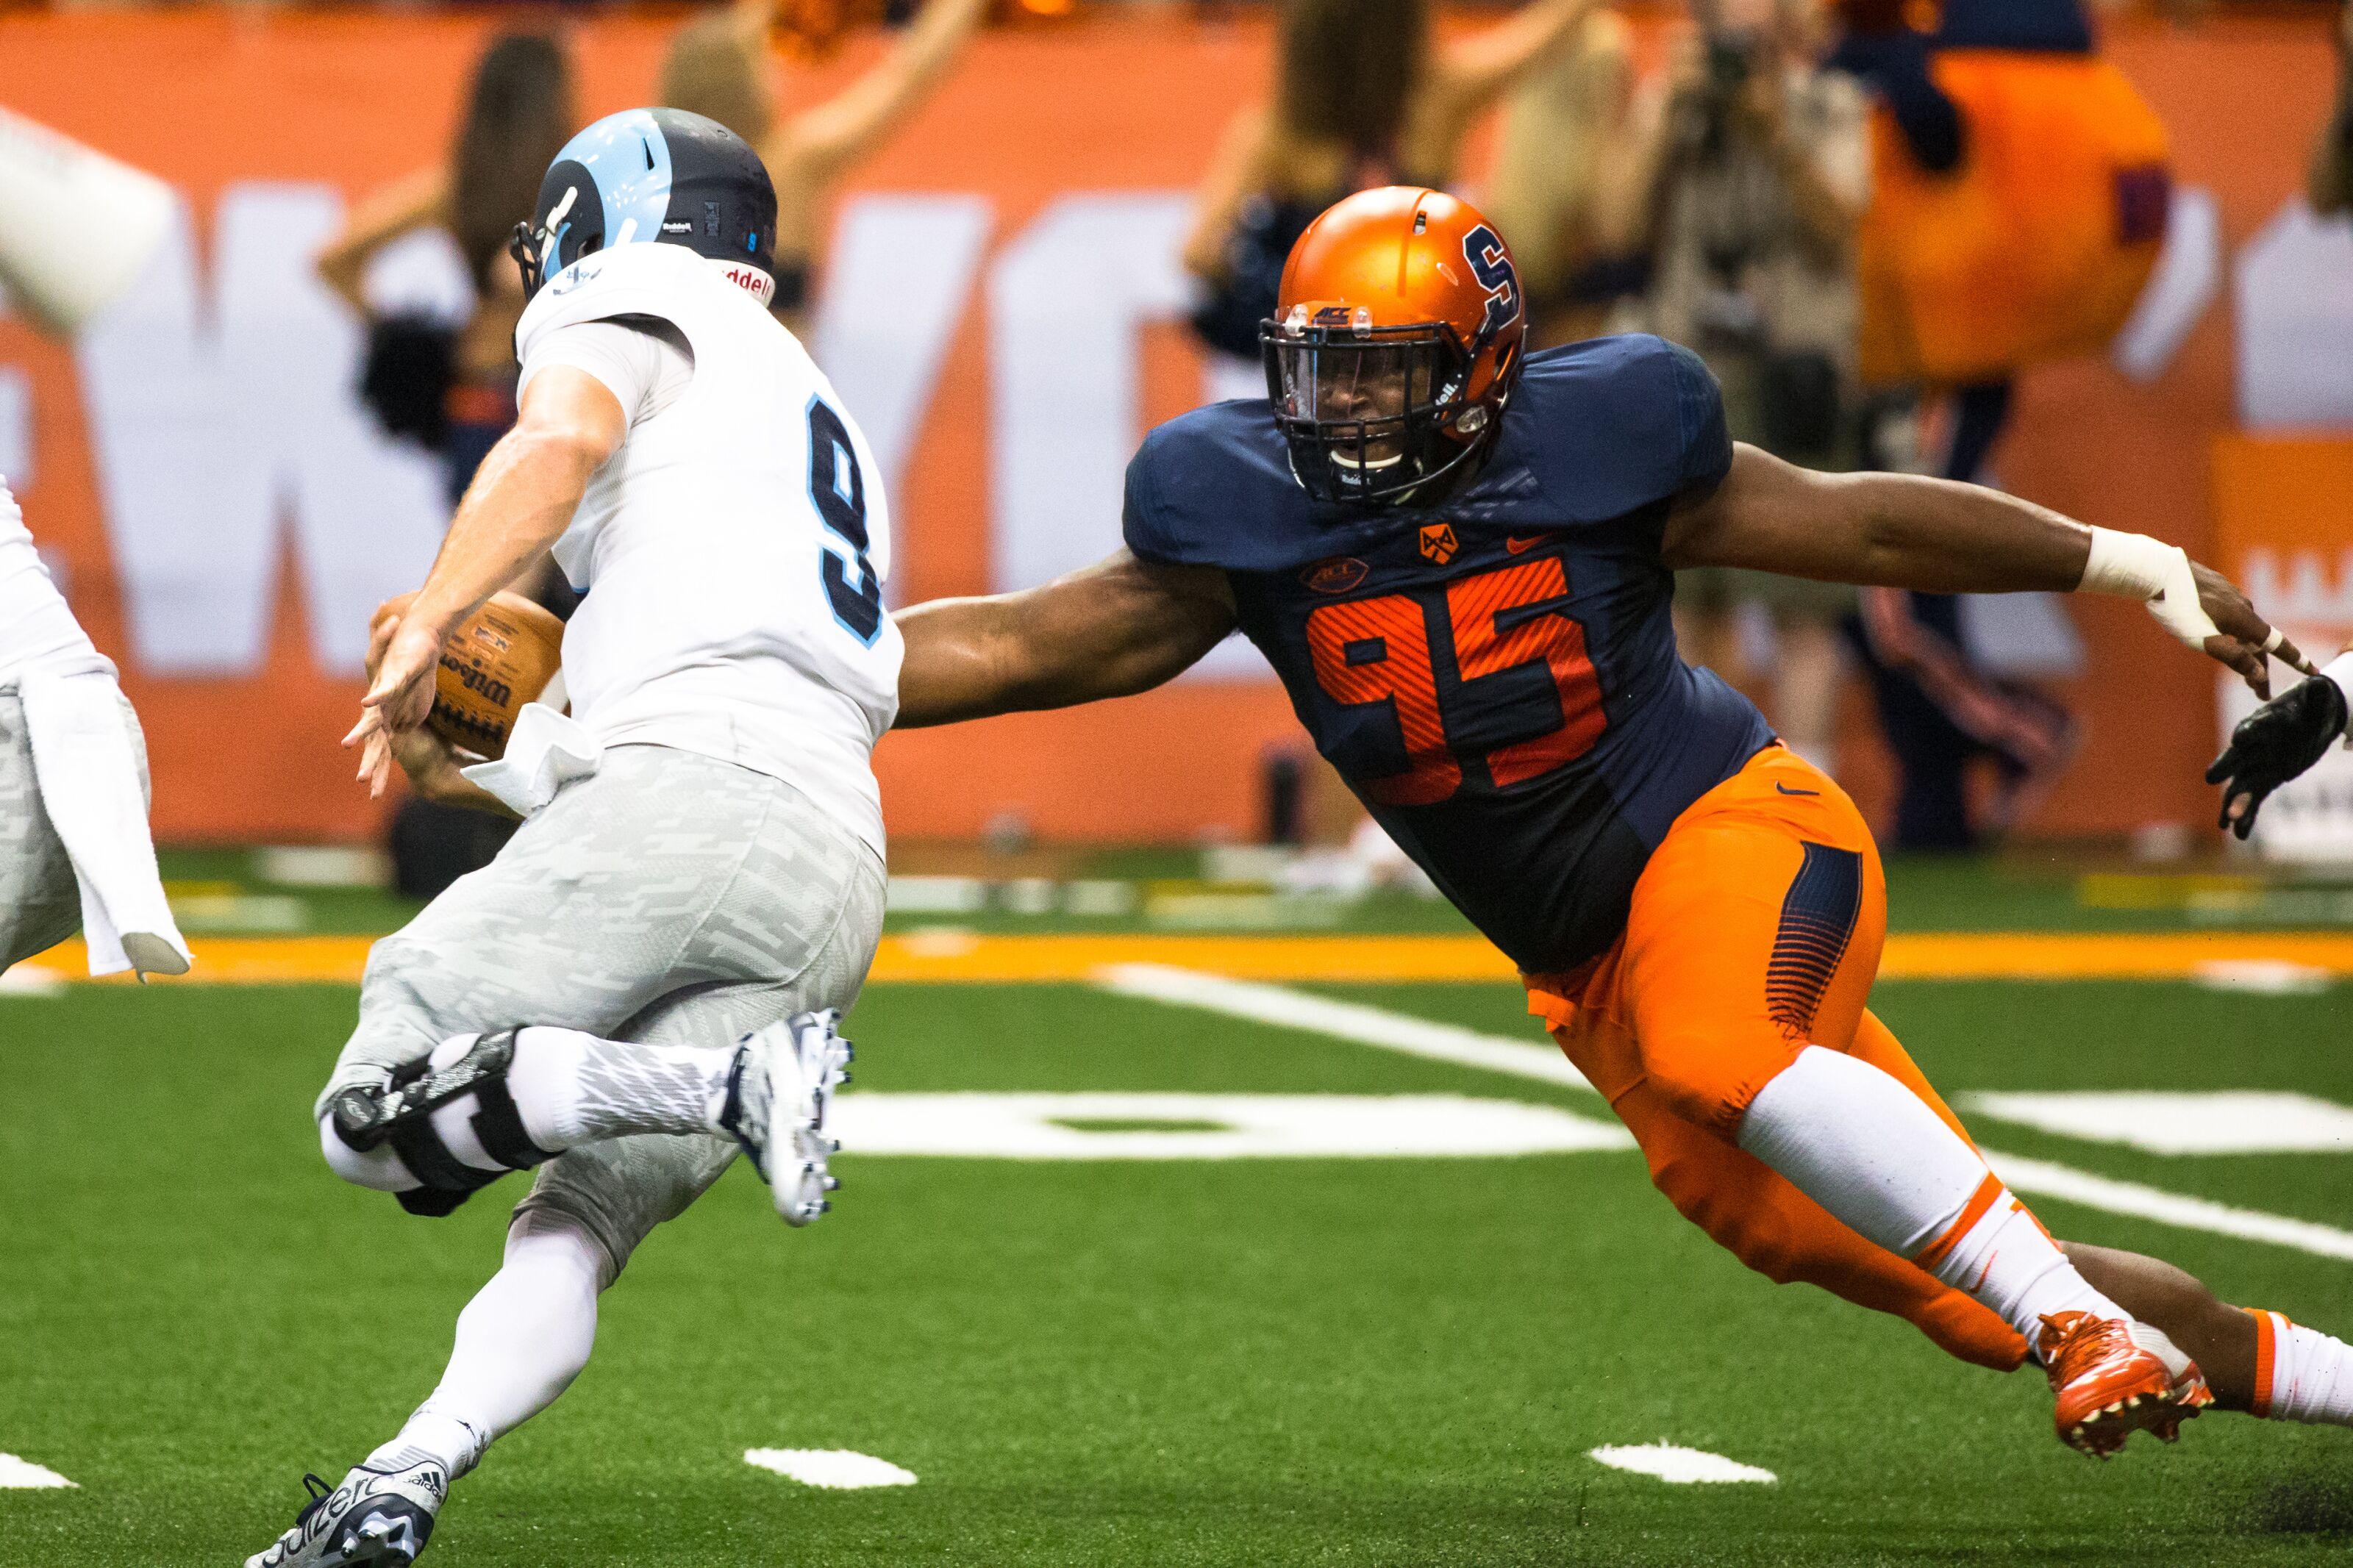 Syracuse Football: New York Giants select Chris Slayton in the 7th round